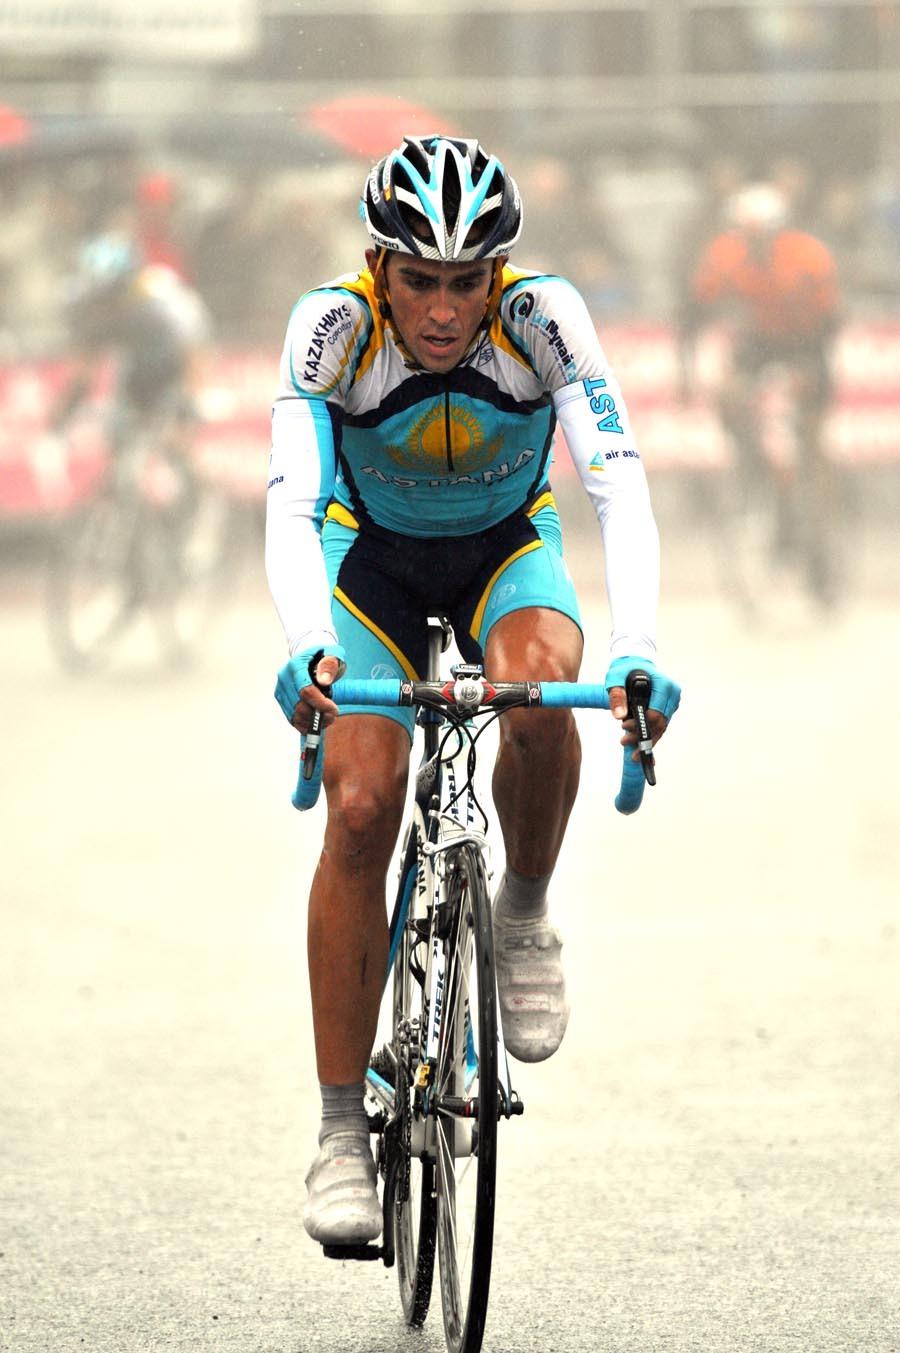 Tour of Spain 2008